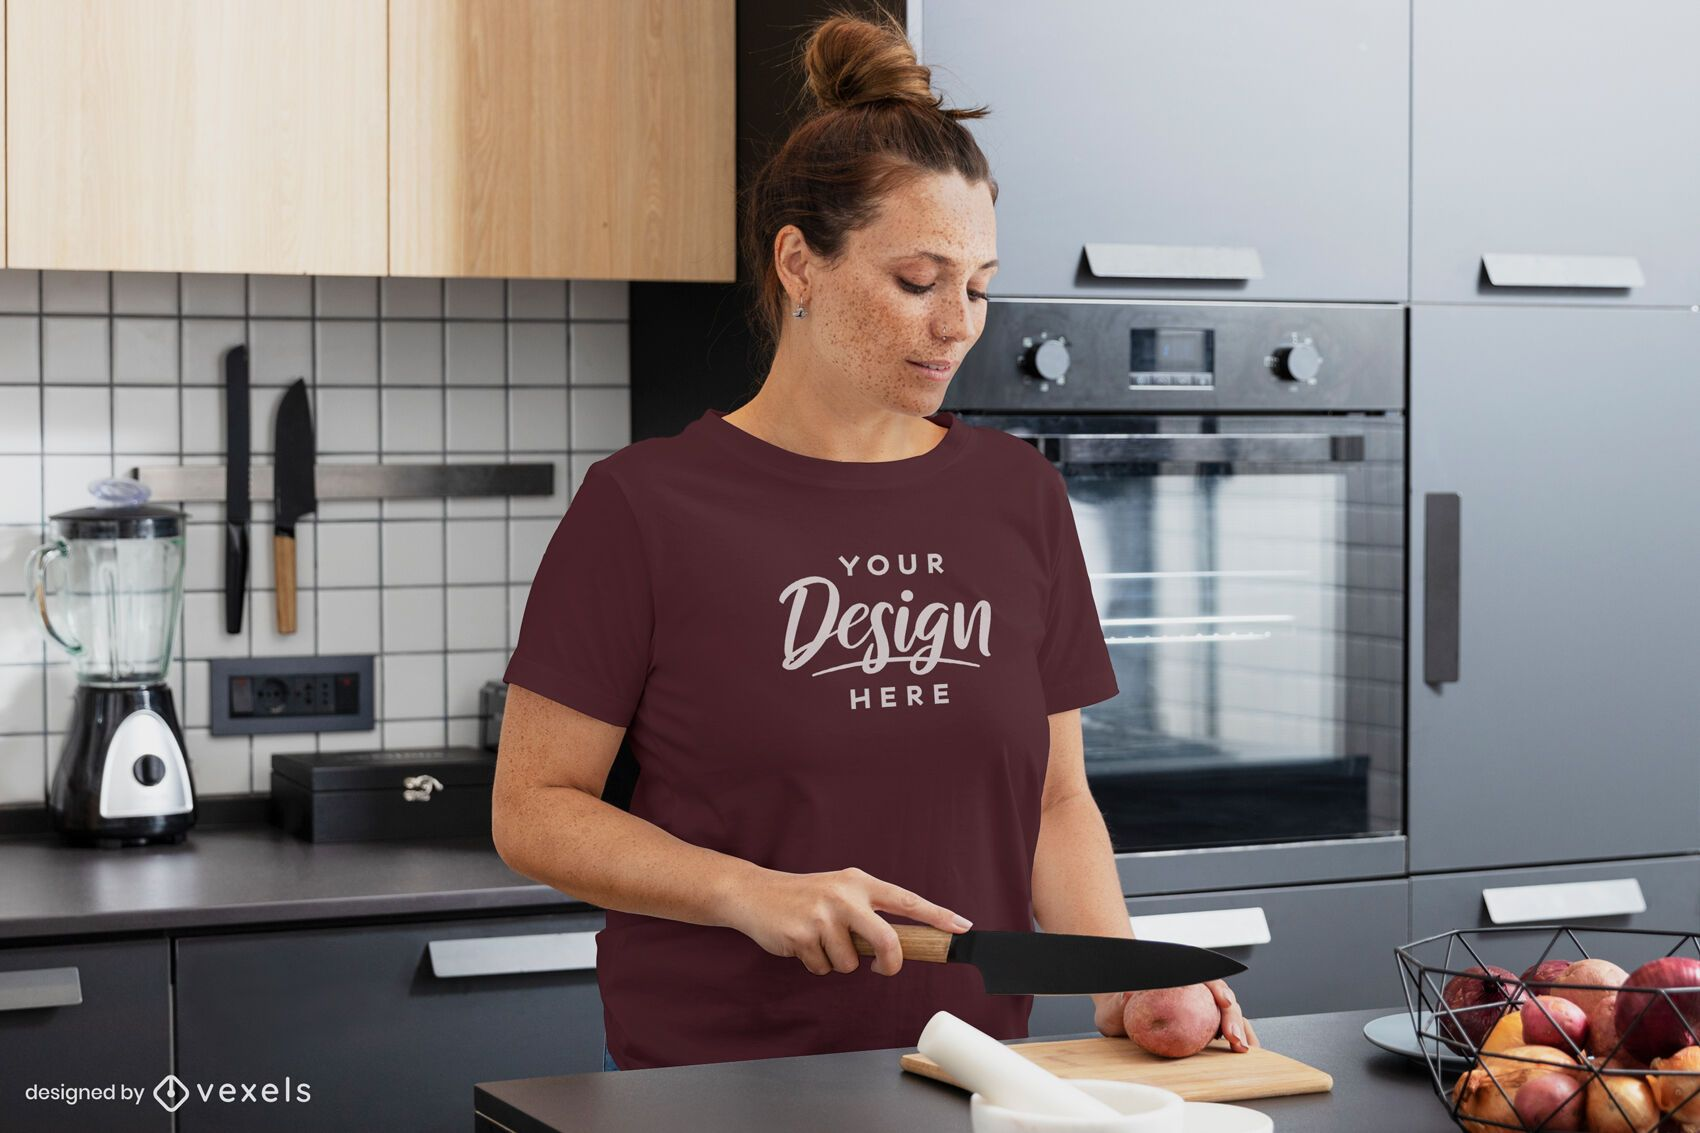 Frau, die Küchen-T-Shirt-Modell kocht